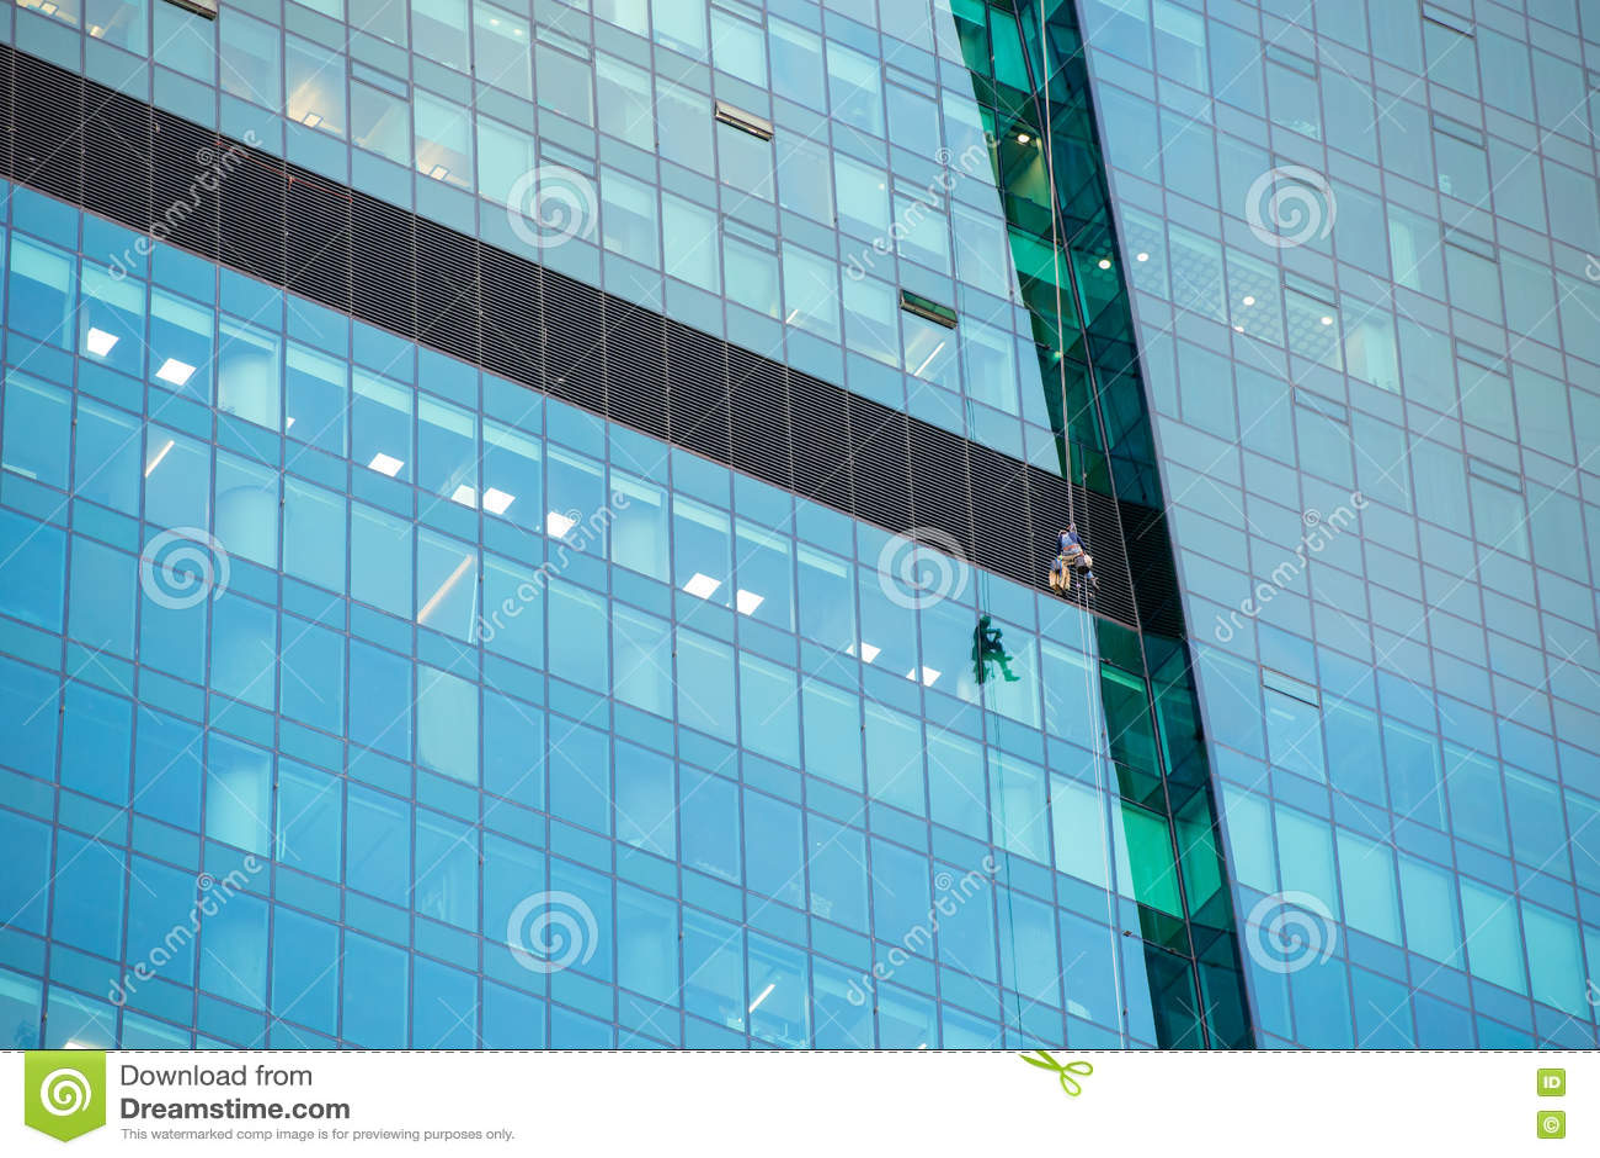 Líquidos de limpeza de janela no trabalho